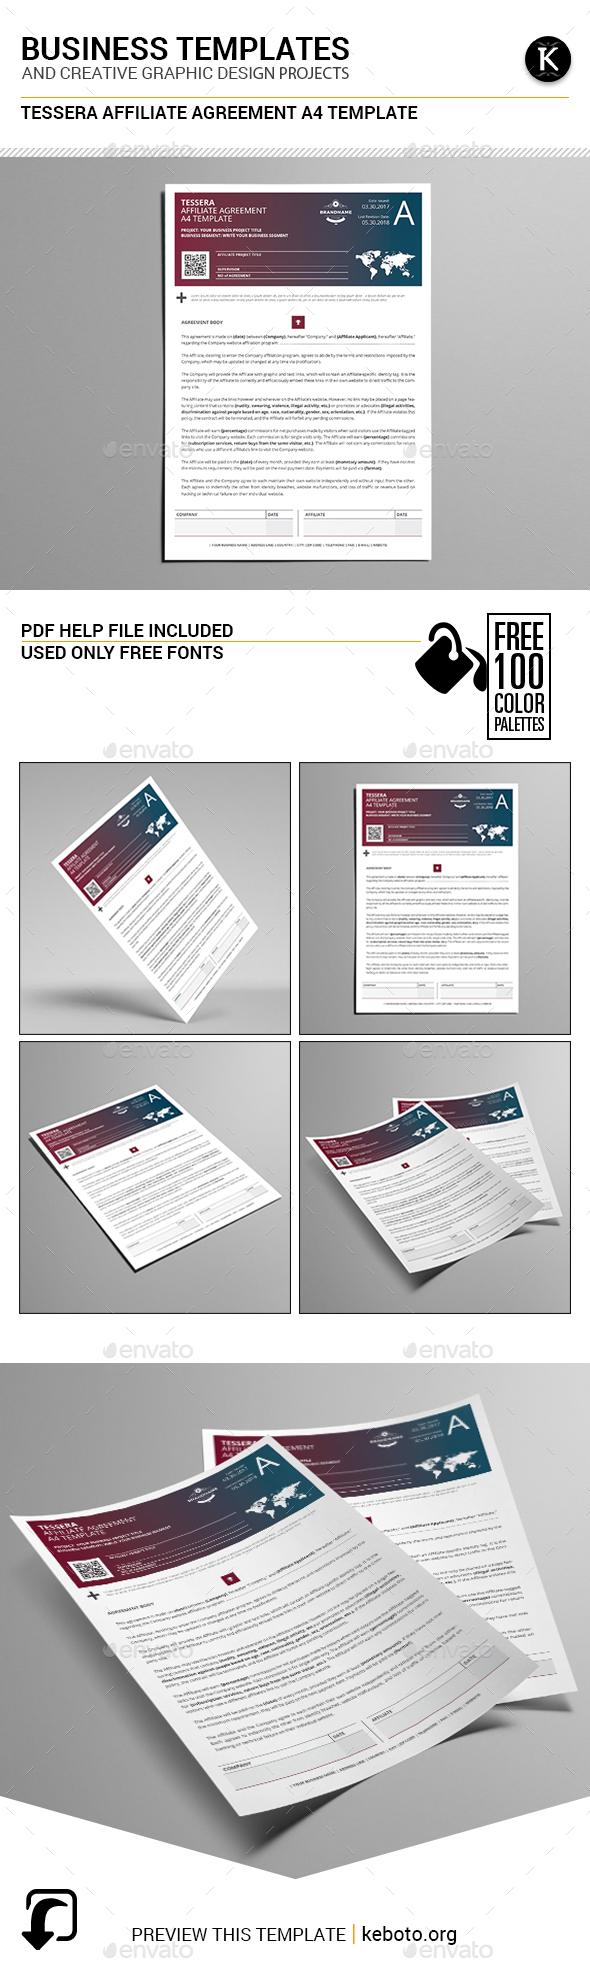 Tessera Affiliate Agreement A4 Template - Miscellaneous Print Templates